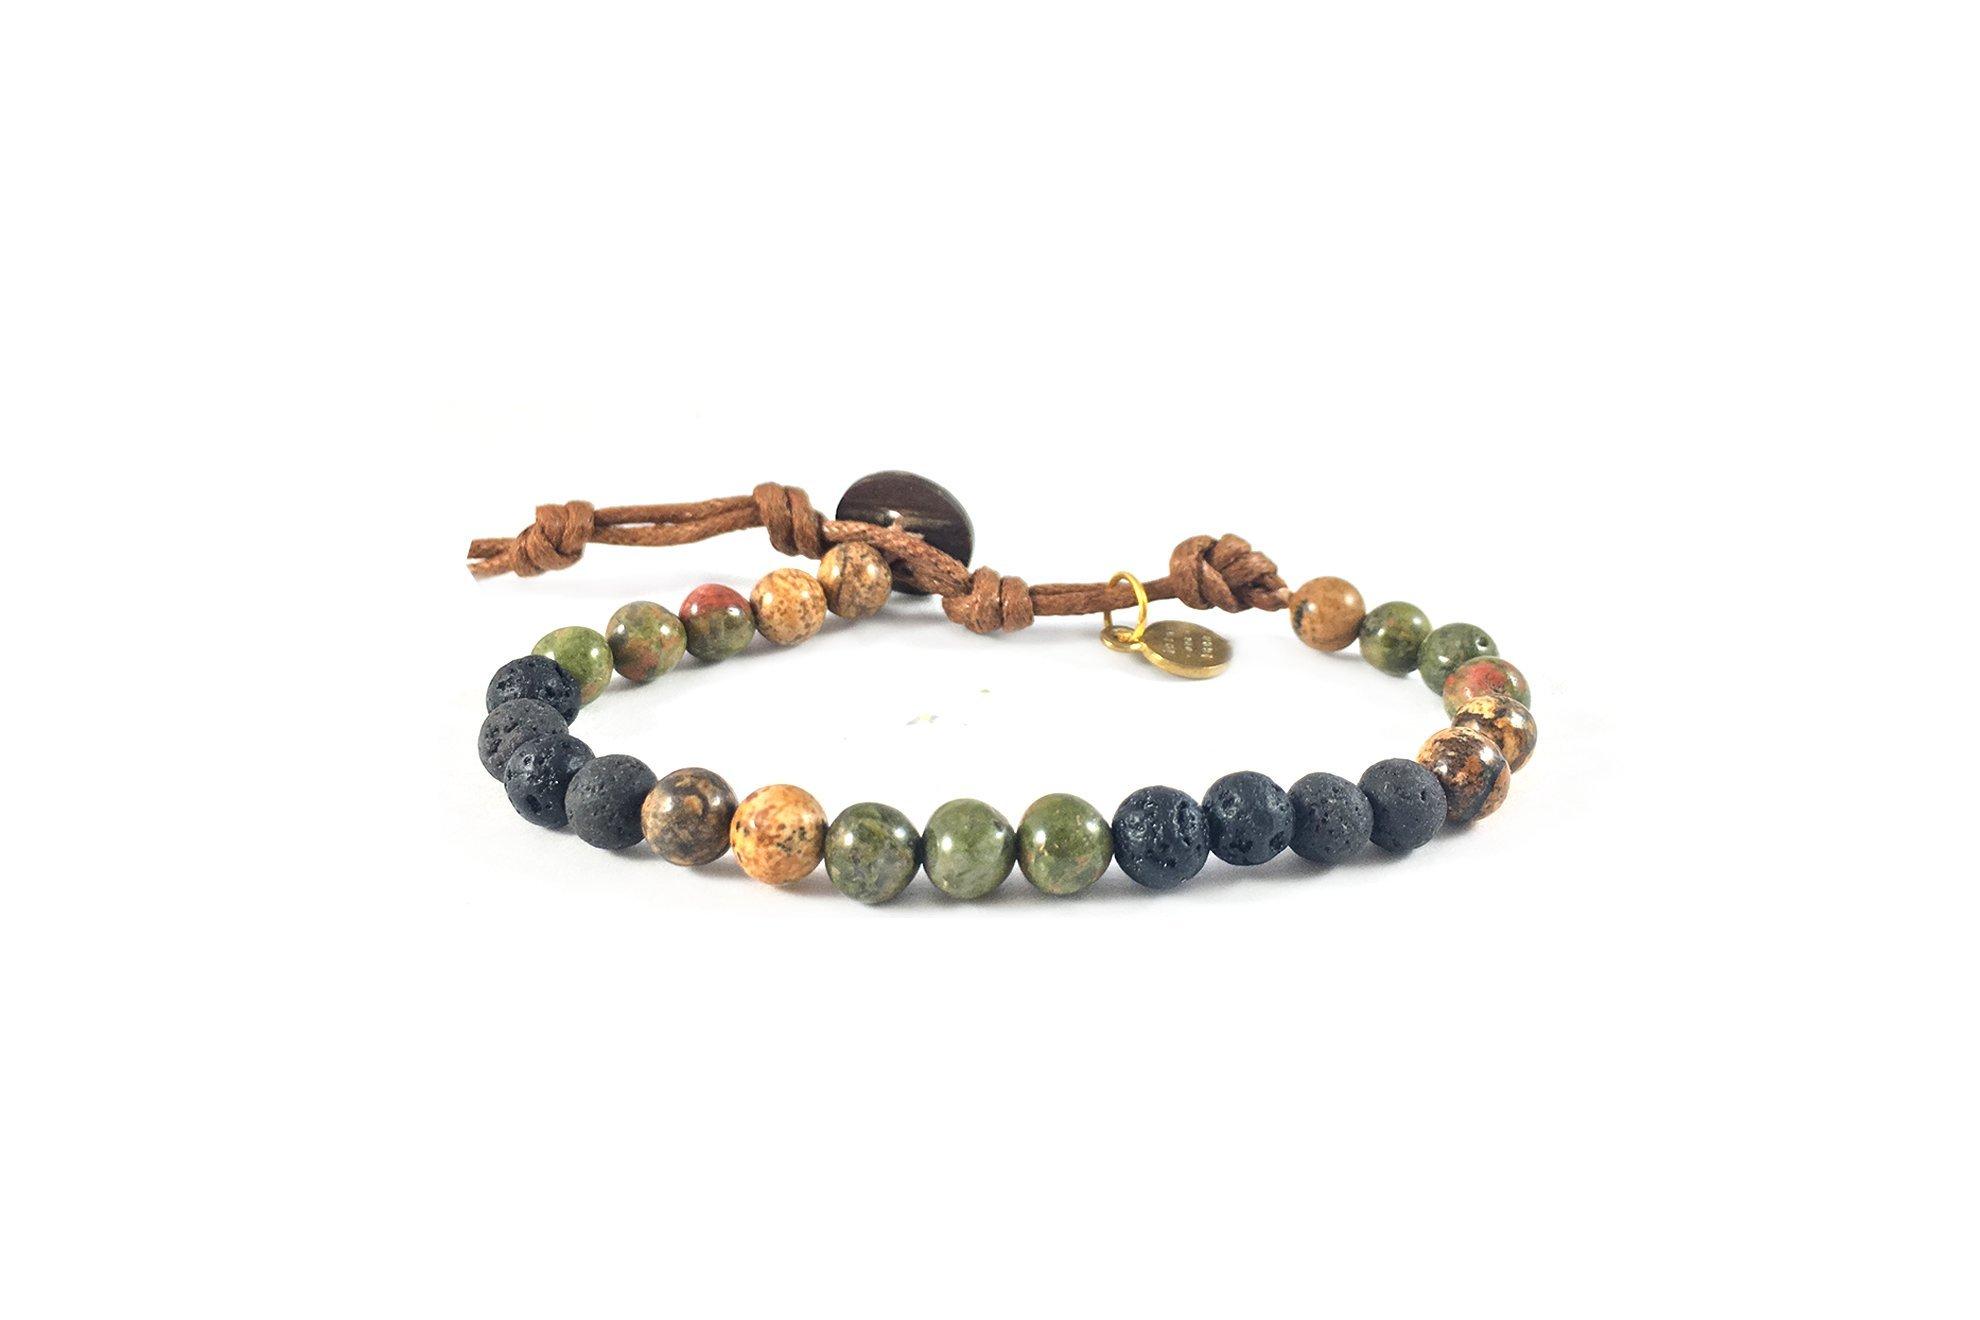 Lotus and Luna Peace and Strength 6mm Lava Stone, Unakite and Jasper Healing Bracelet